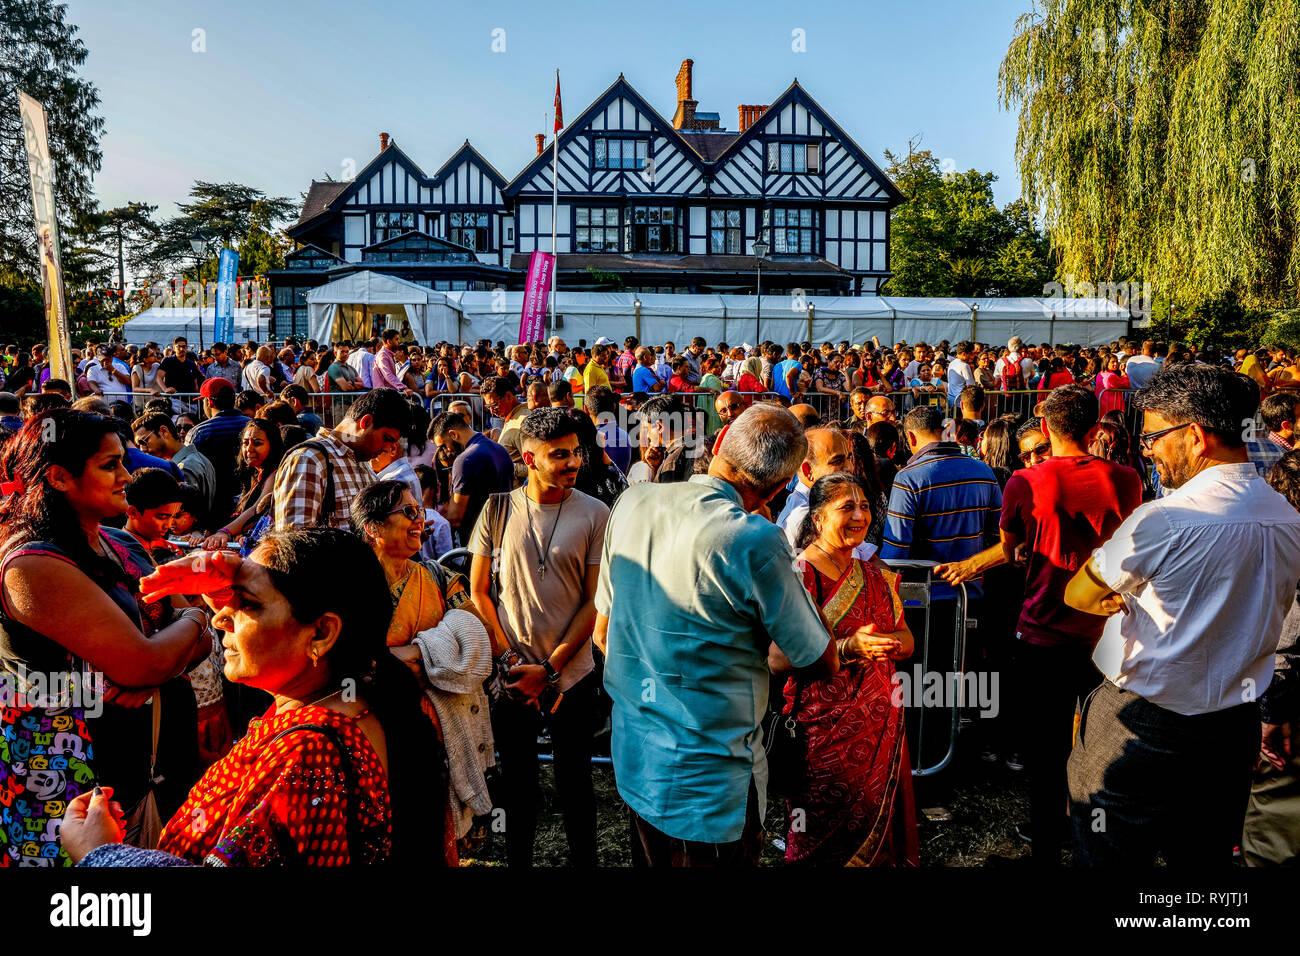 Janmashtami fête hindoue au Bhaktivedanta Manor, Watford, Royaume-Uni Queue en dehors du temple. Photo Stock